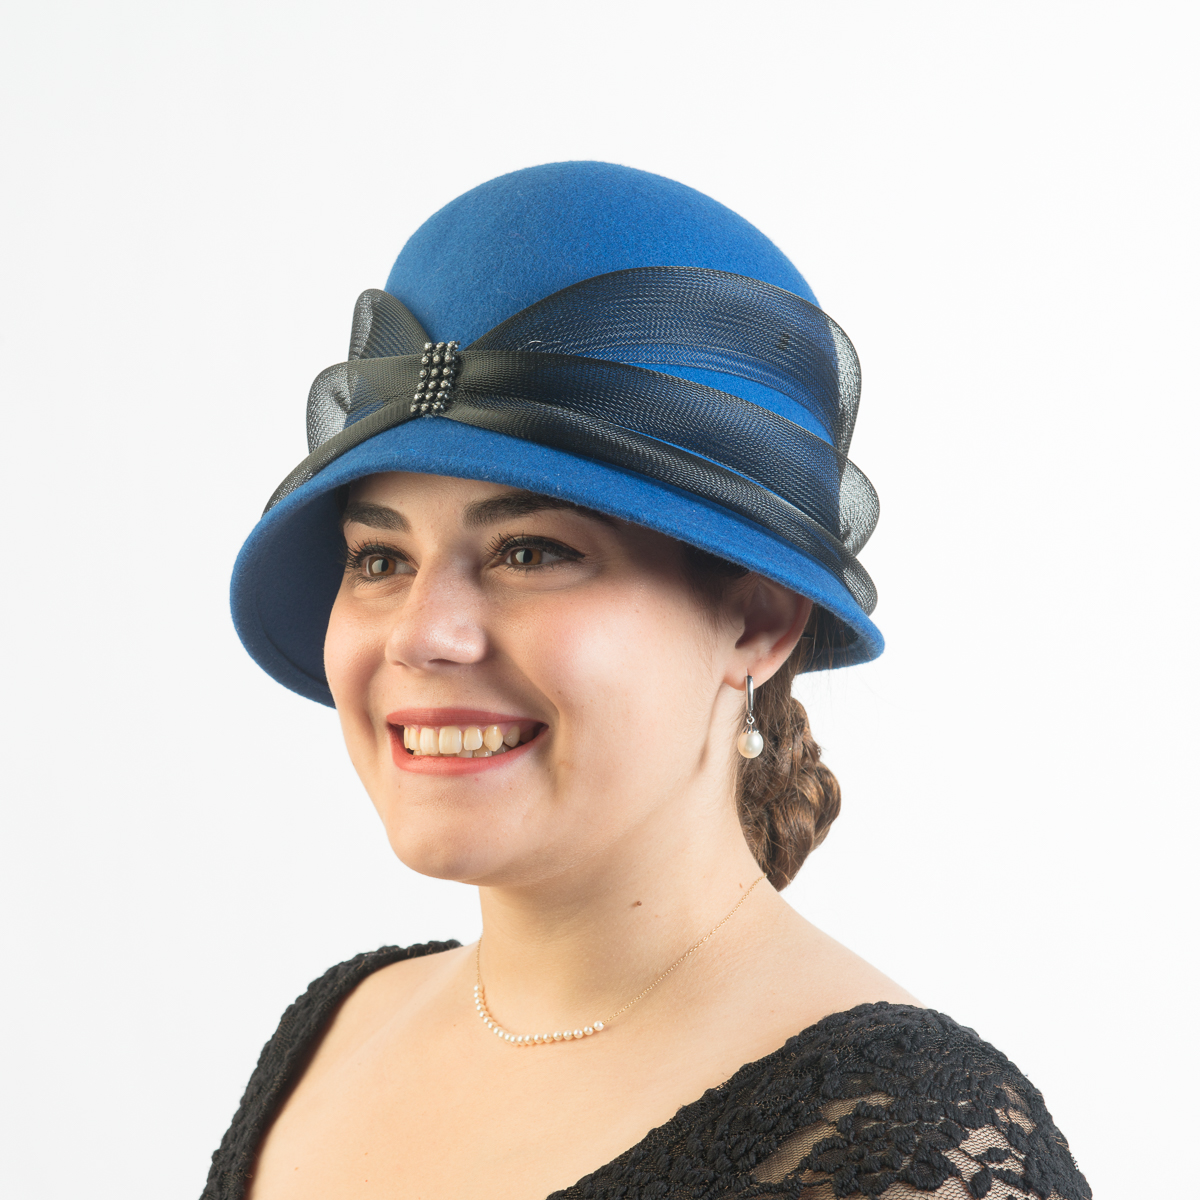 Royal Black Cloche Crinoline Band Hats 400662 Ry Bk Sun